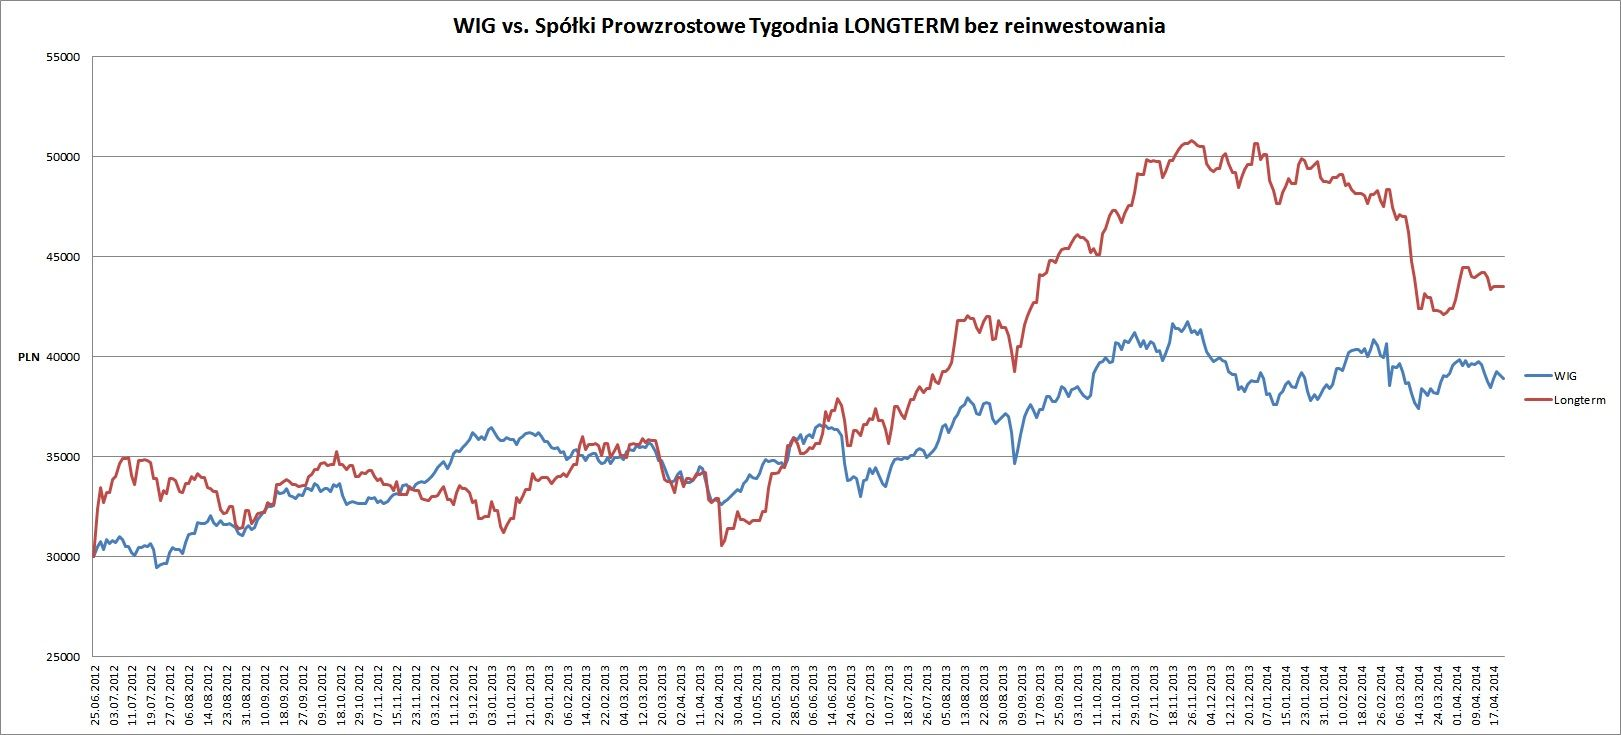 Longterm vs WIG 27.04.14